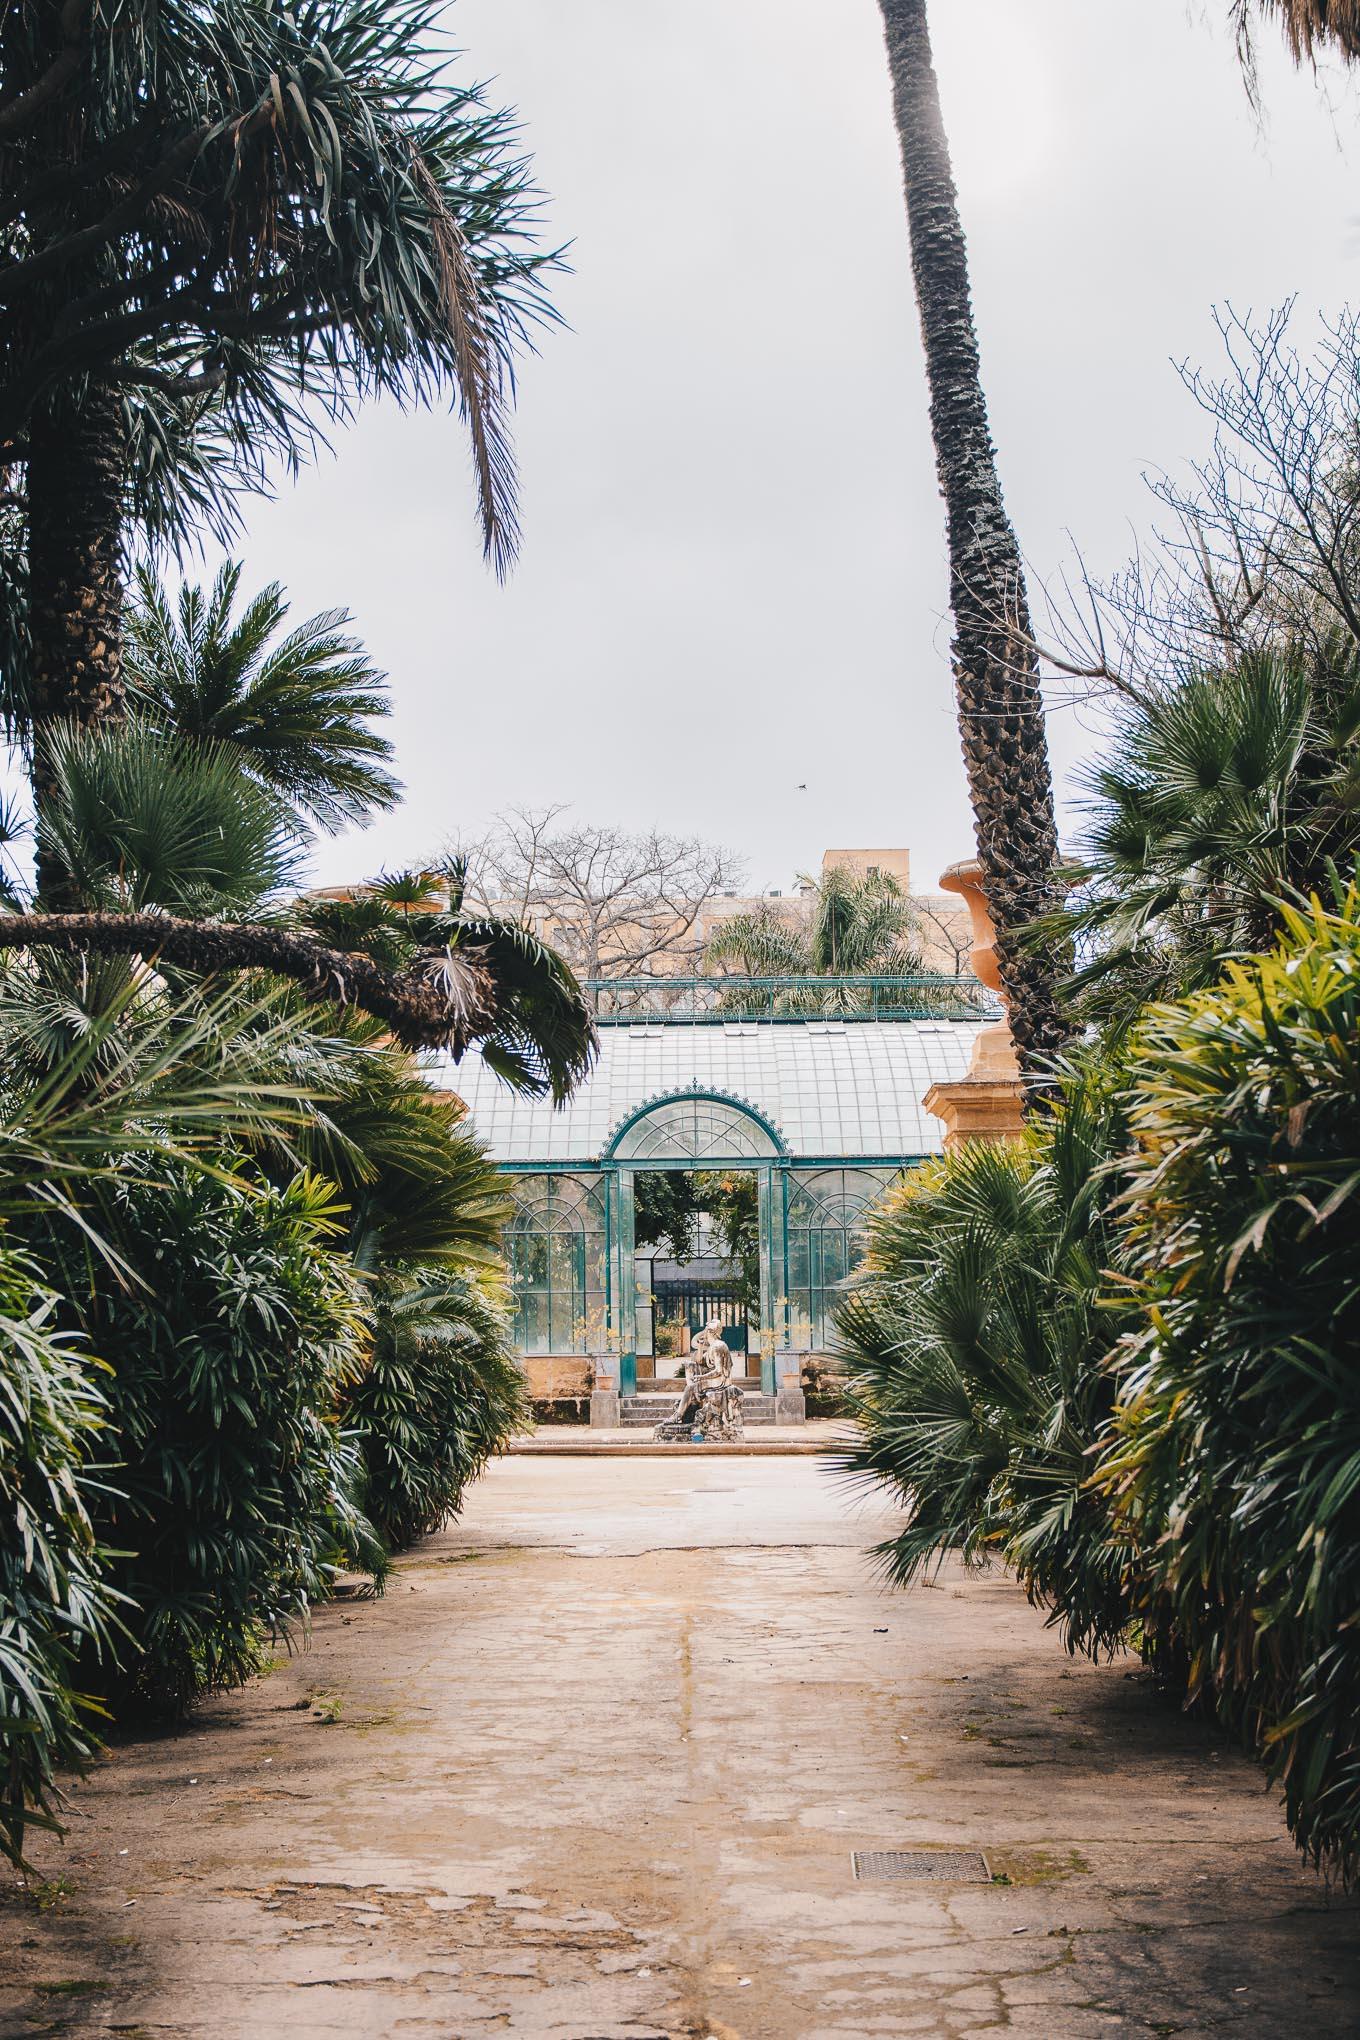 Orto botanico palermo sicily